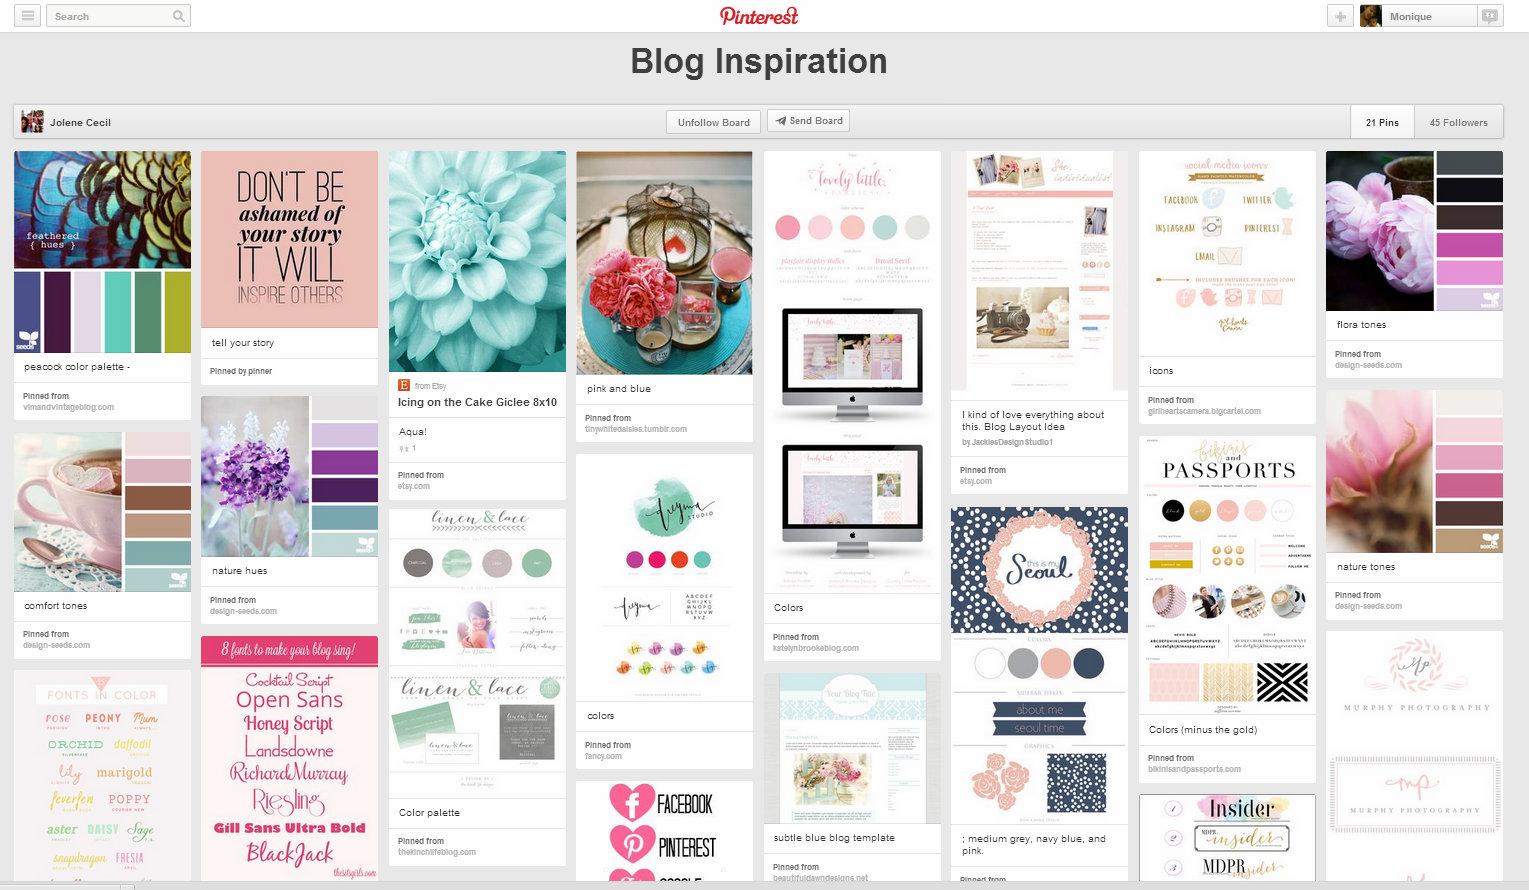 Best Blog Designs how to get the best blog design